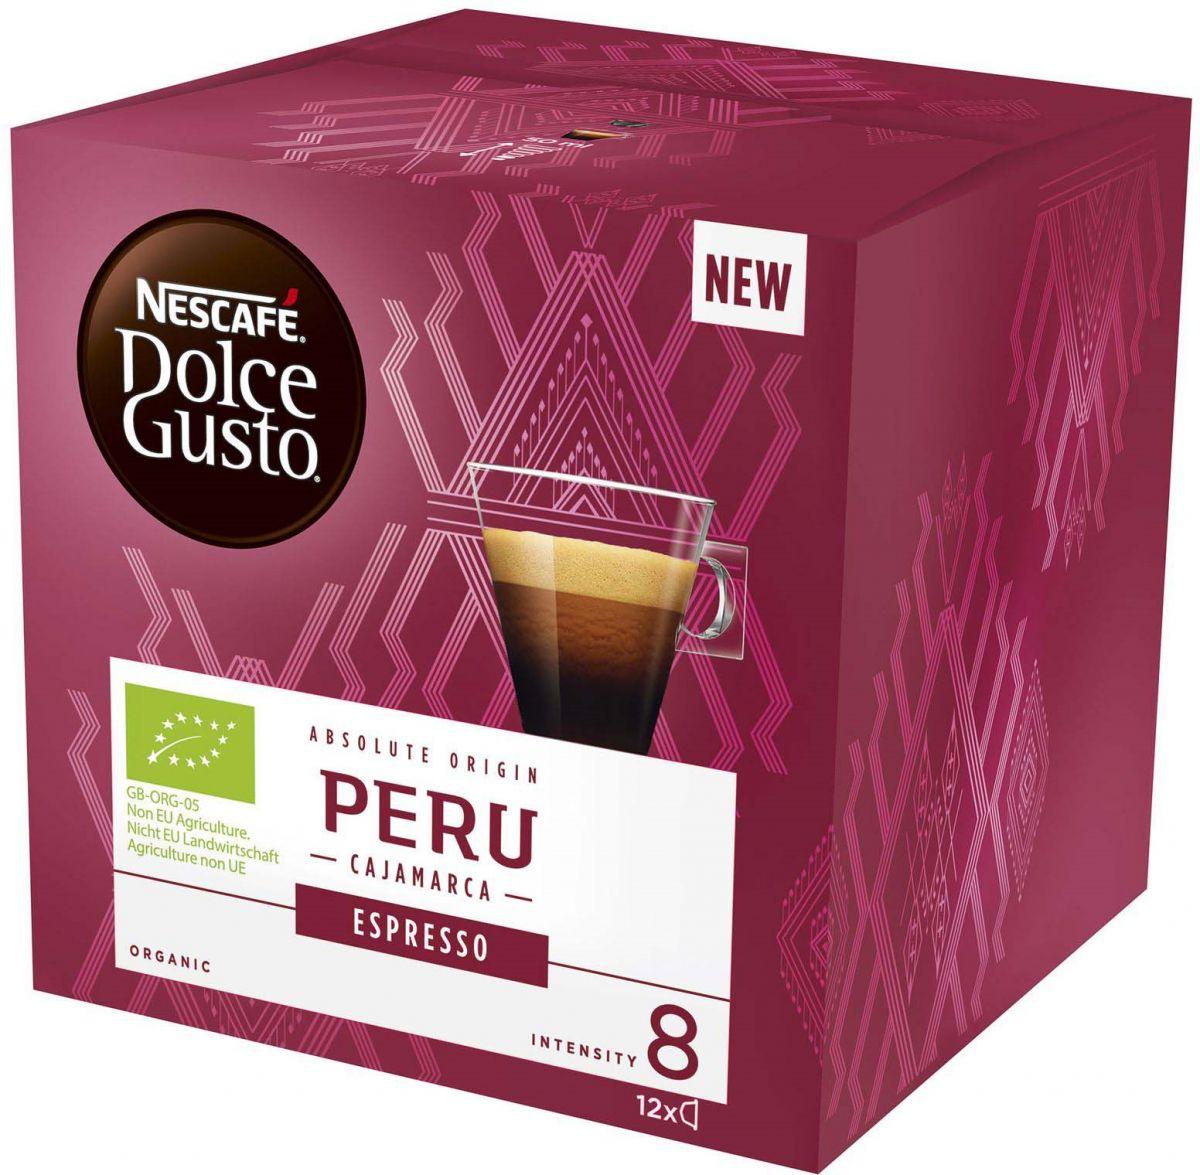 Nescafe Dolce Gusto Peru